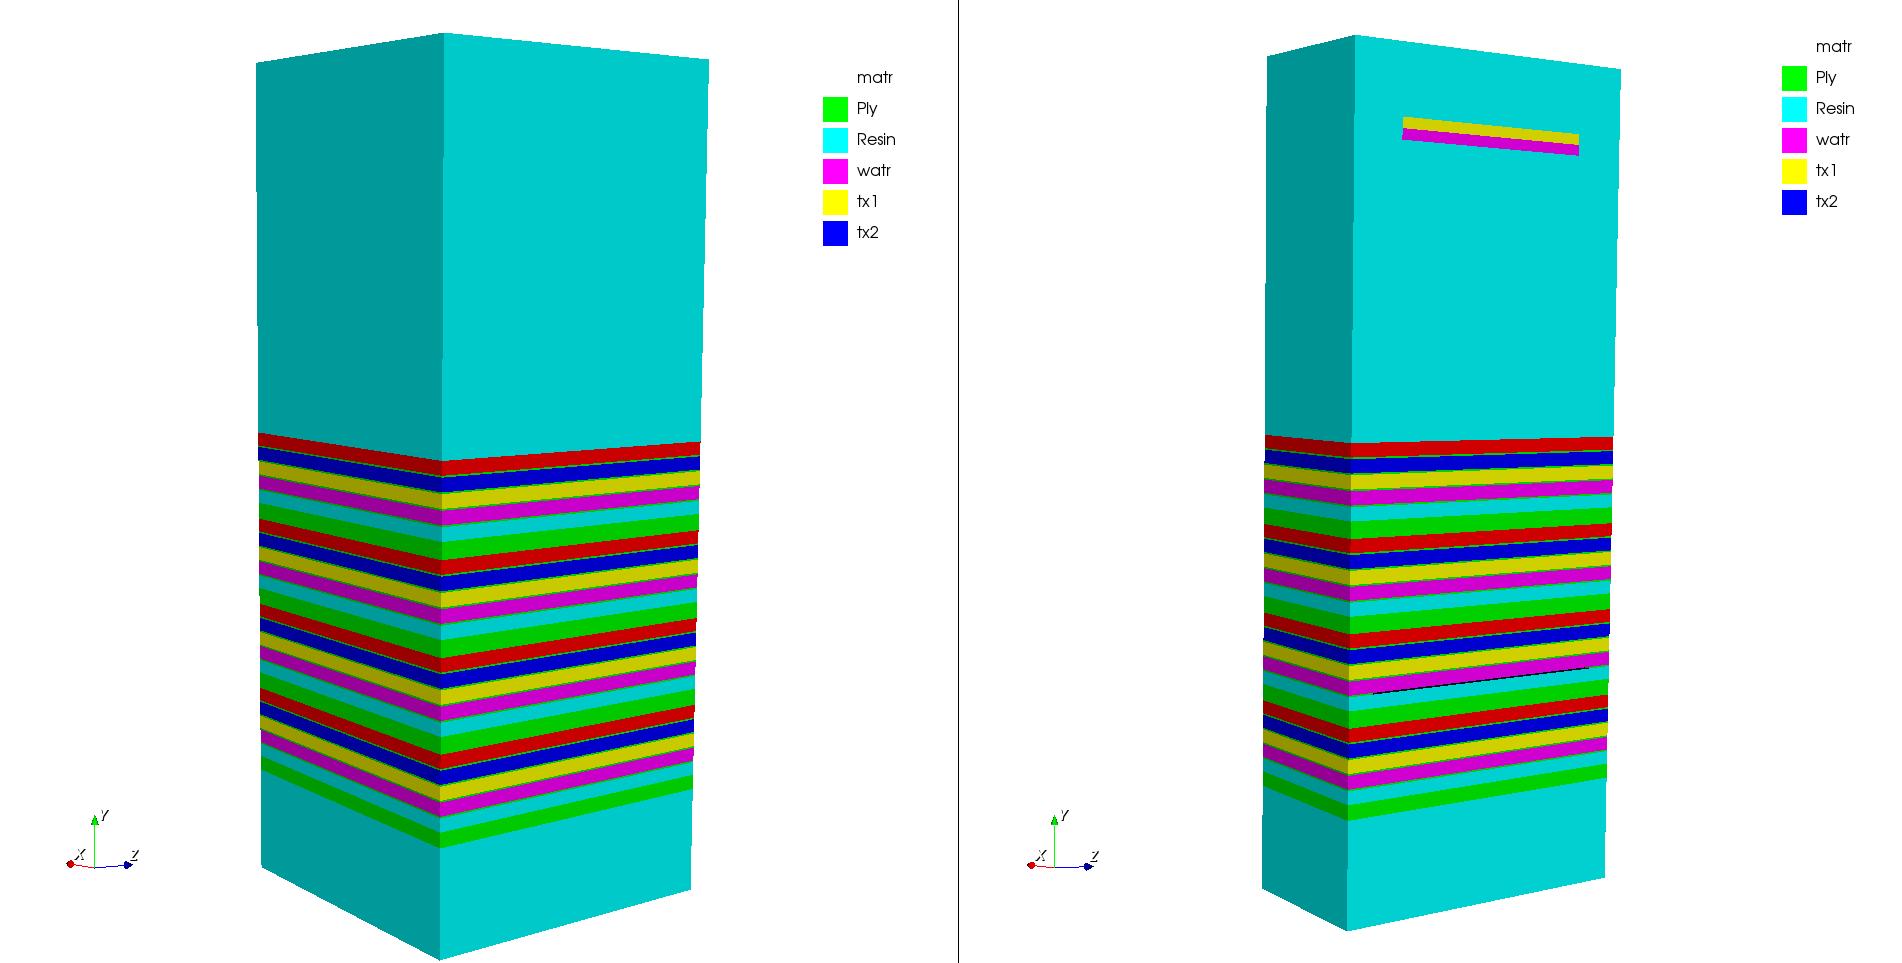 cfrp laminate 3d simulation model onscale